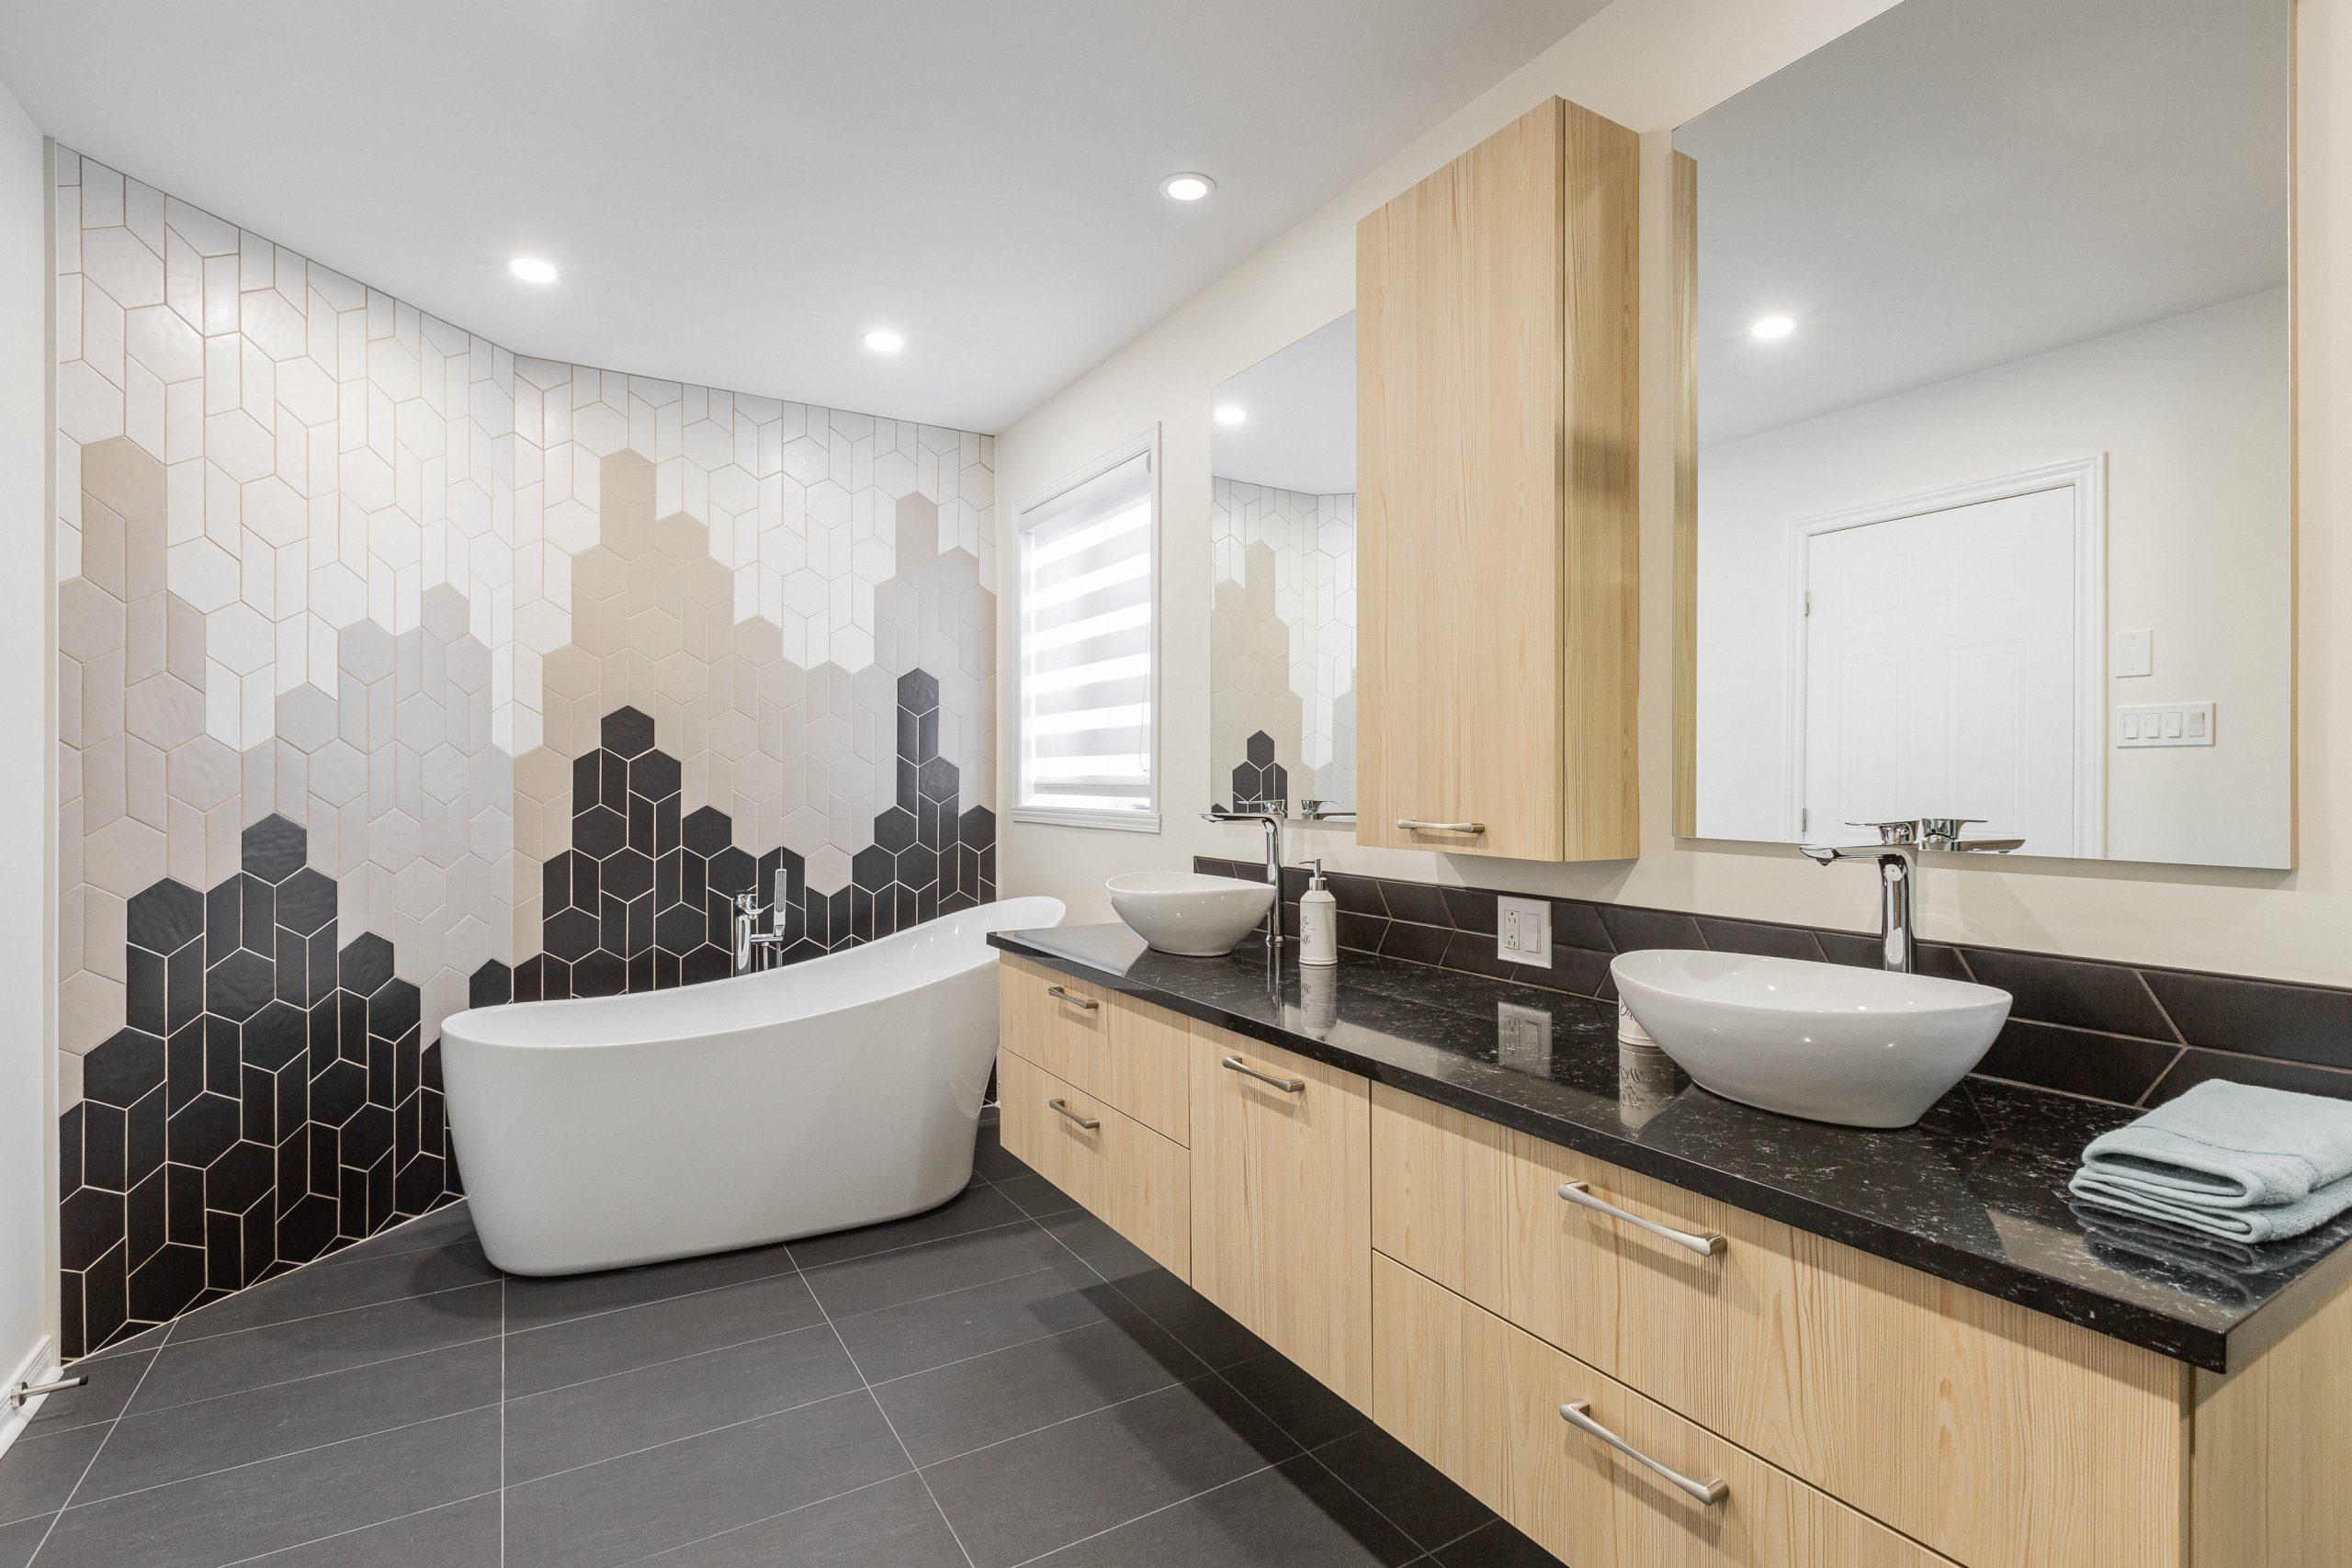 bathromm renovation with a modernfreestandingbathtube andgeometric patterned tileson two walls